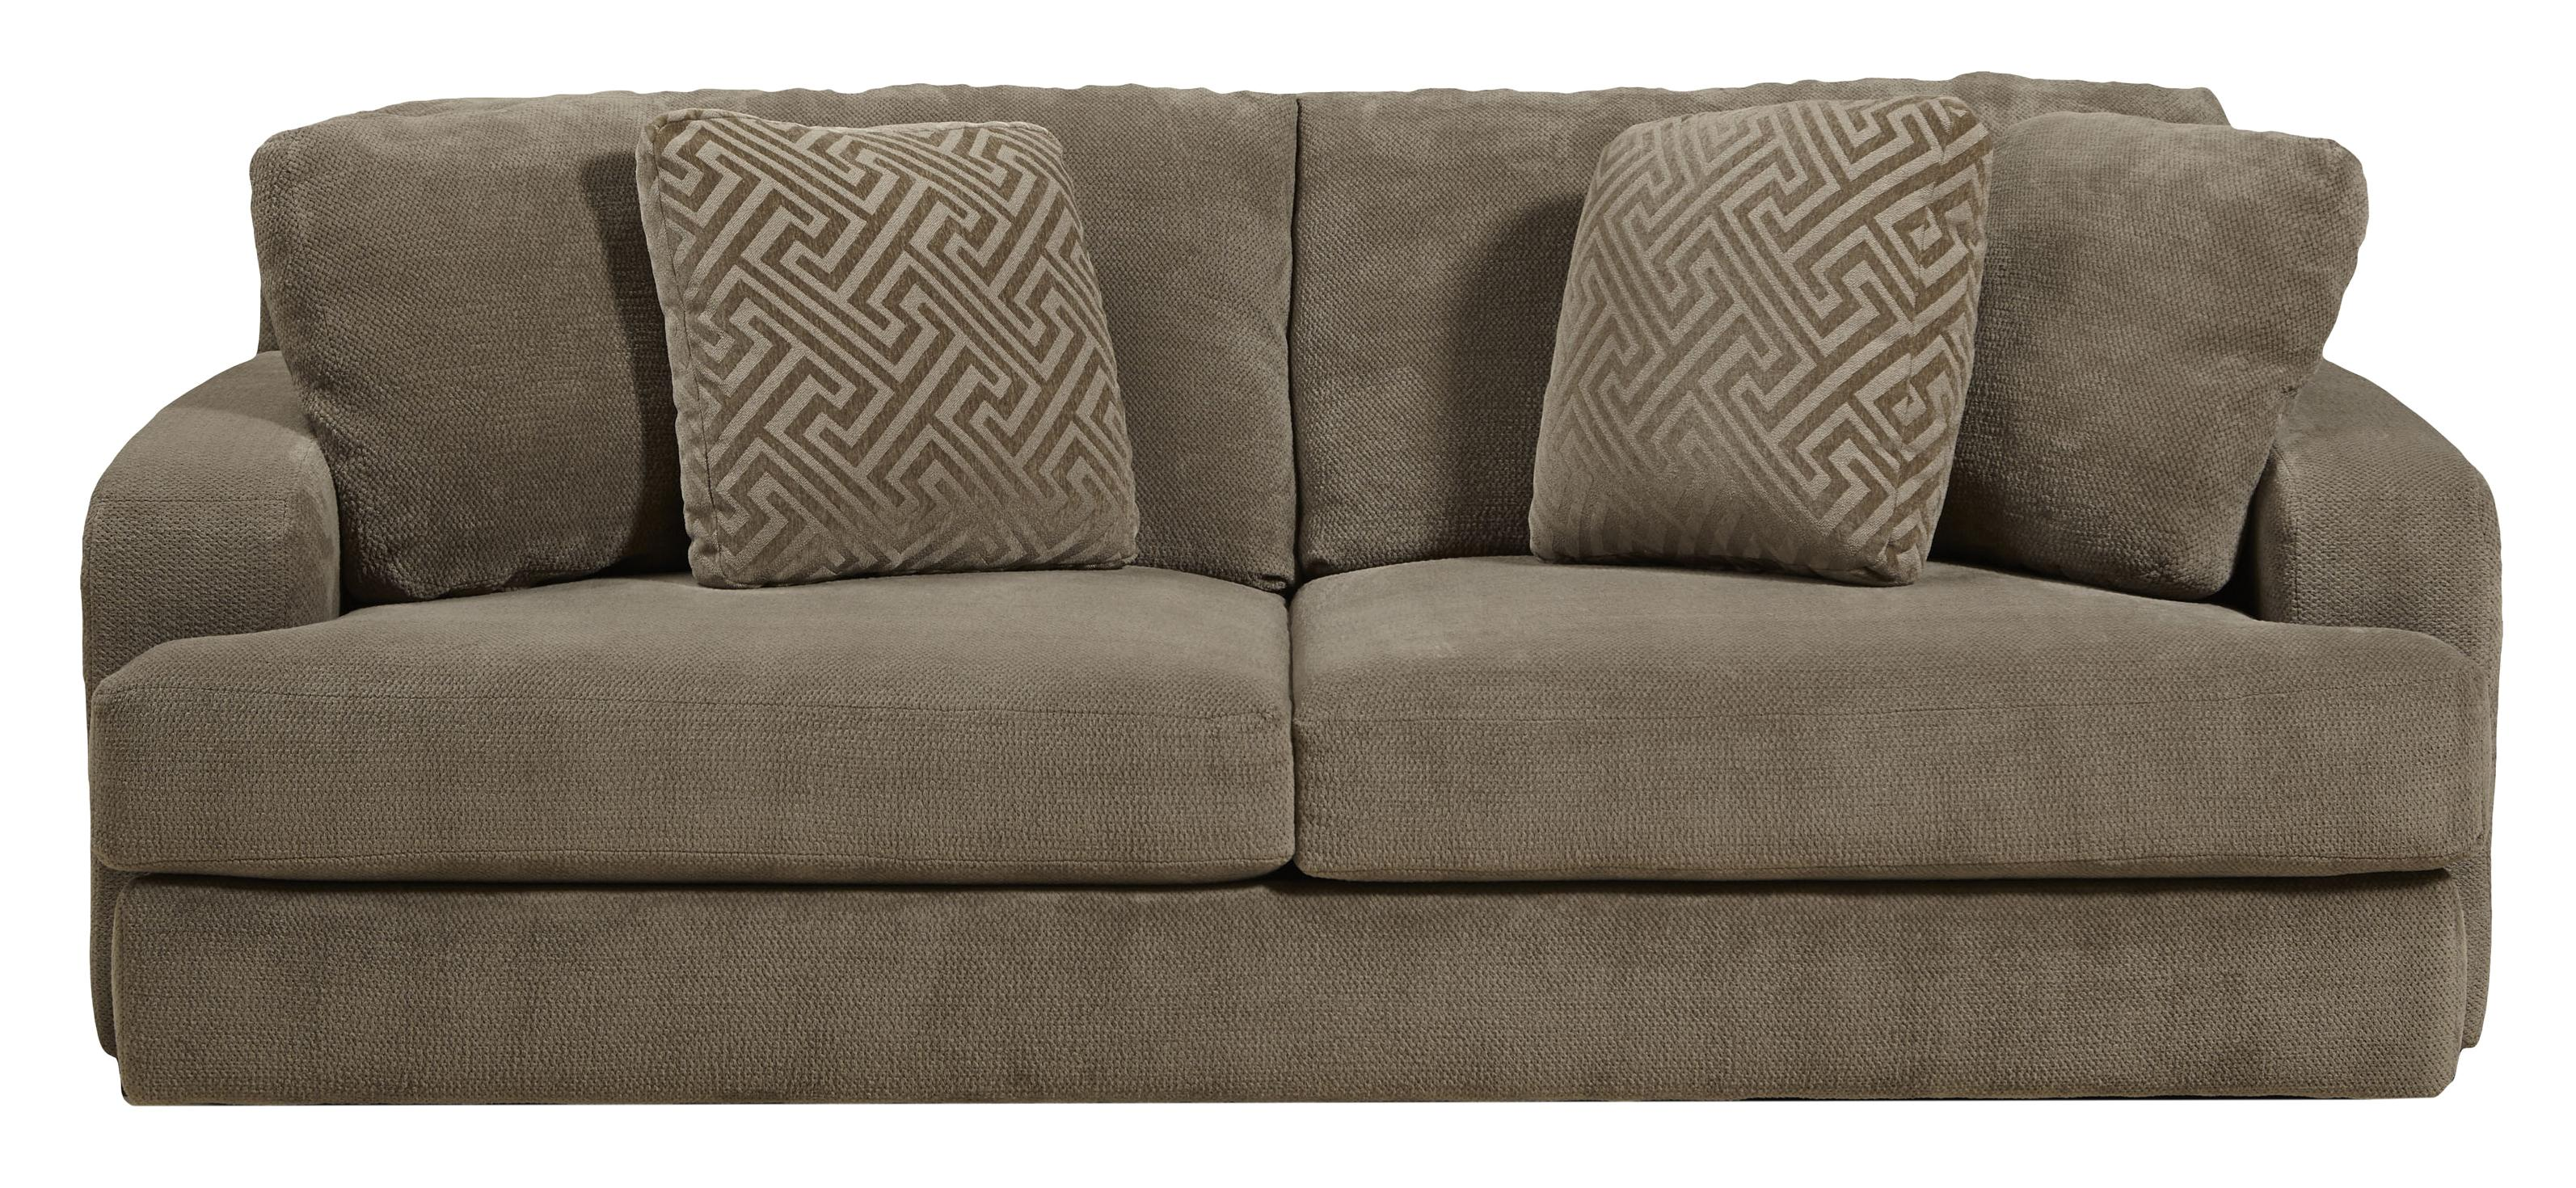 Jackson Furniture Palisades Sofa - Item Number: 4186-03 1983-49